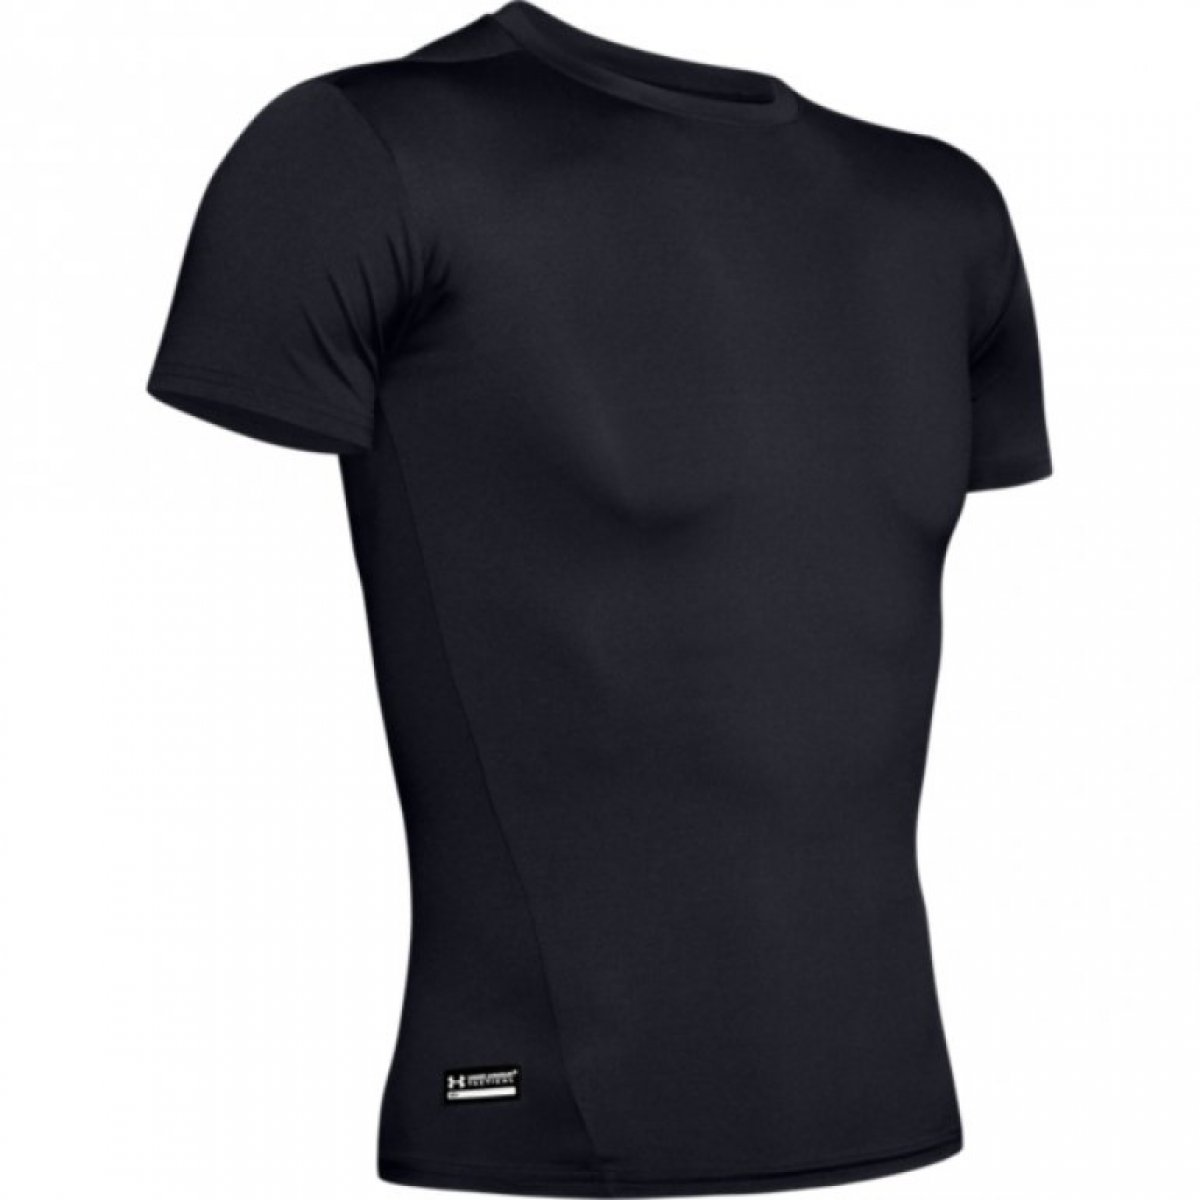 Męska koszulka kompresyjna UNDER ARMOUR TAC HG COMP T